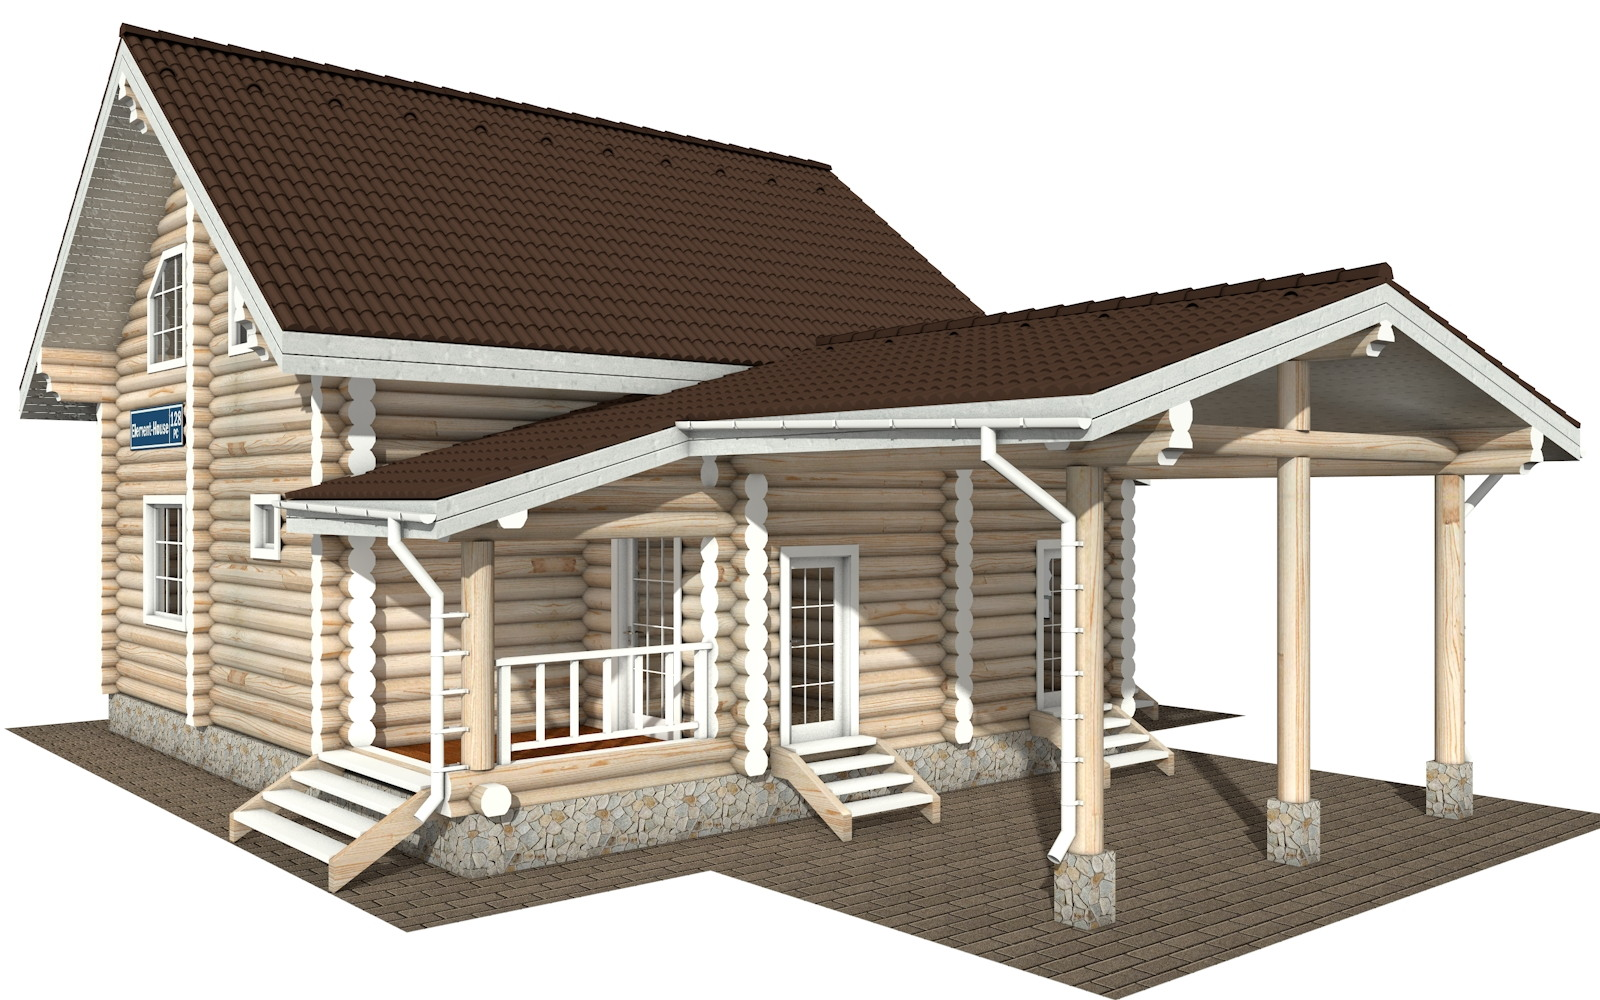 РС-128 - Проект дома из бревна с мансардой